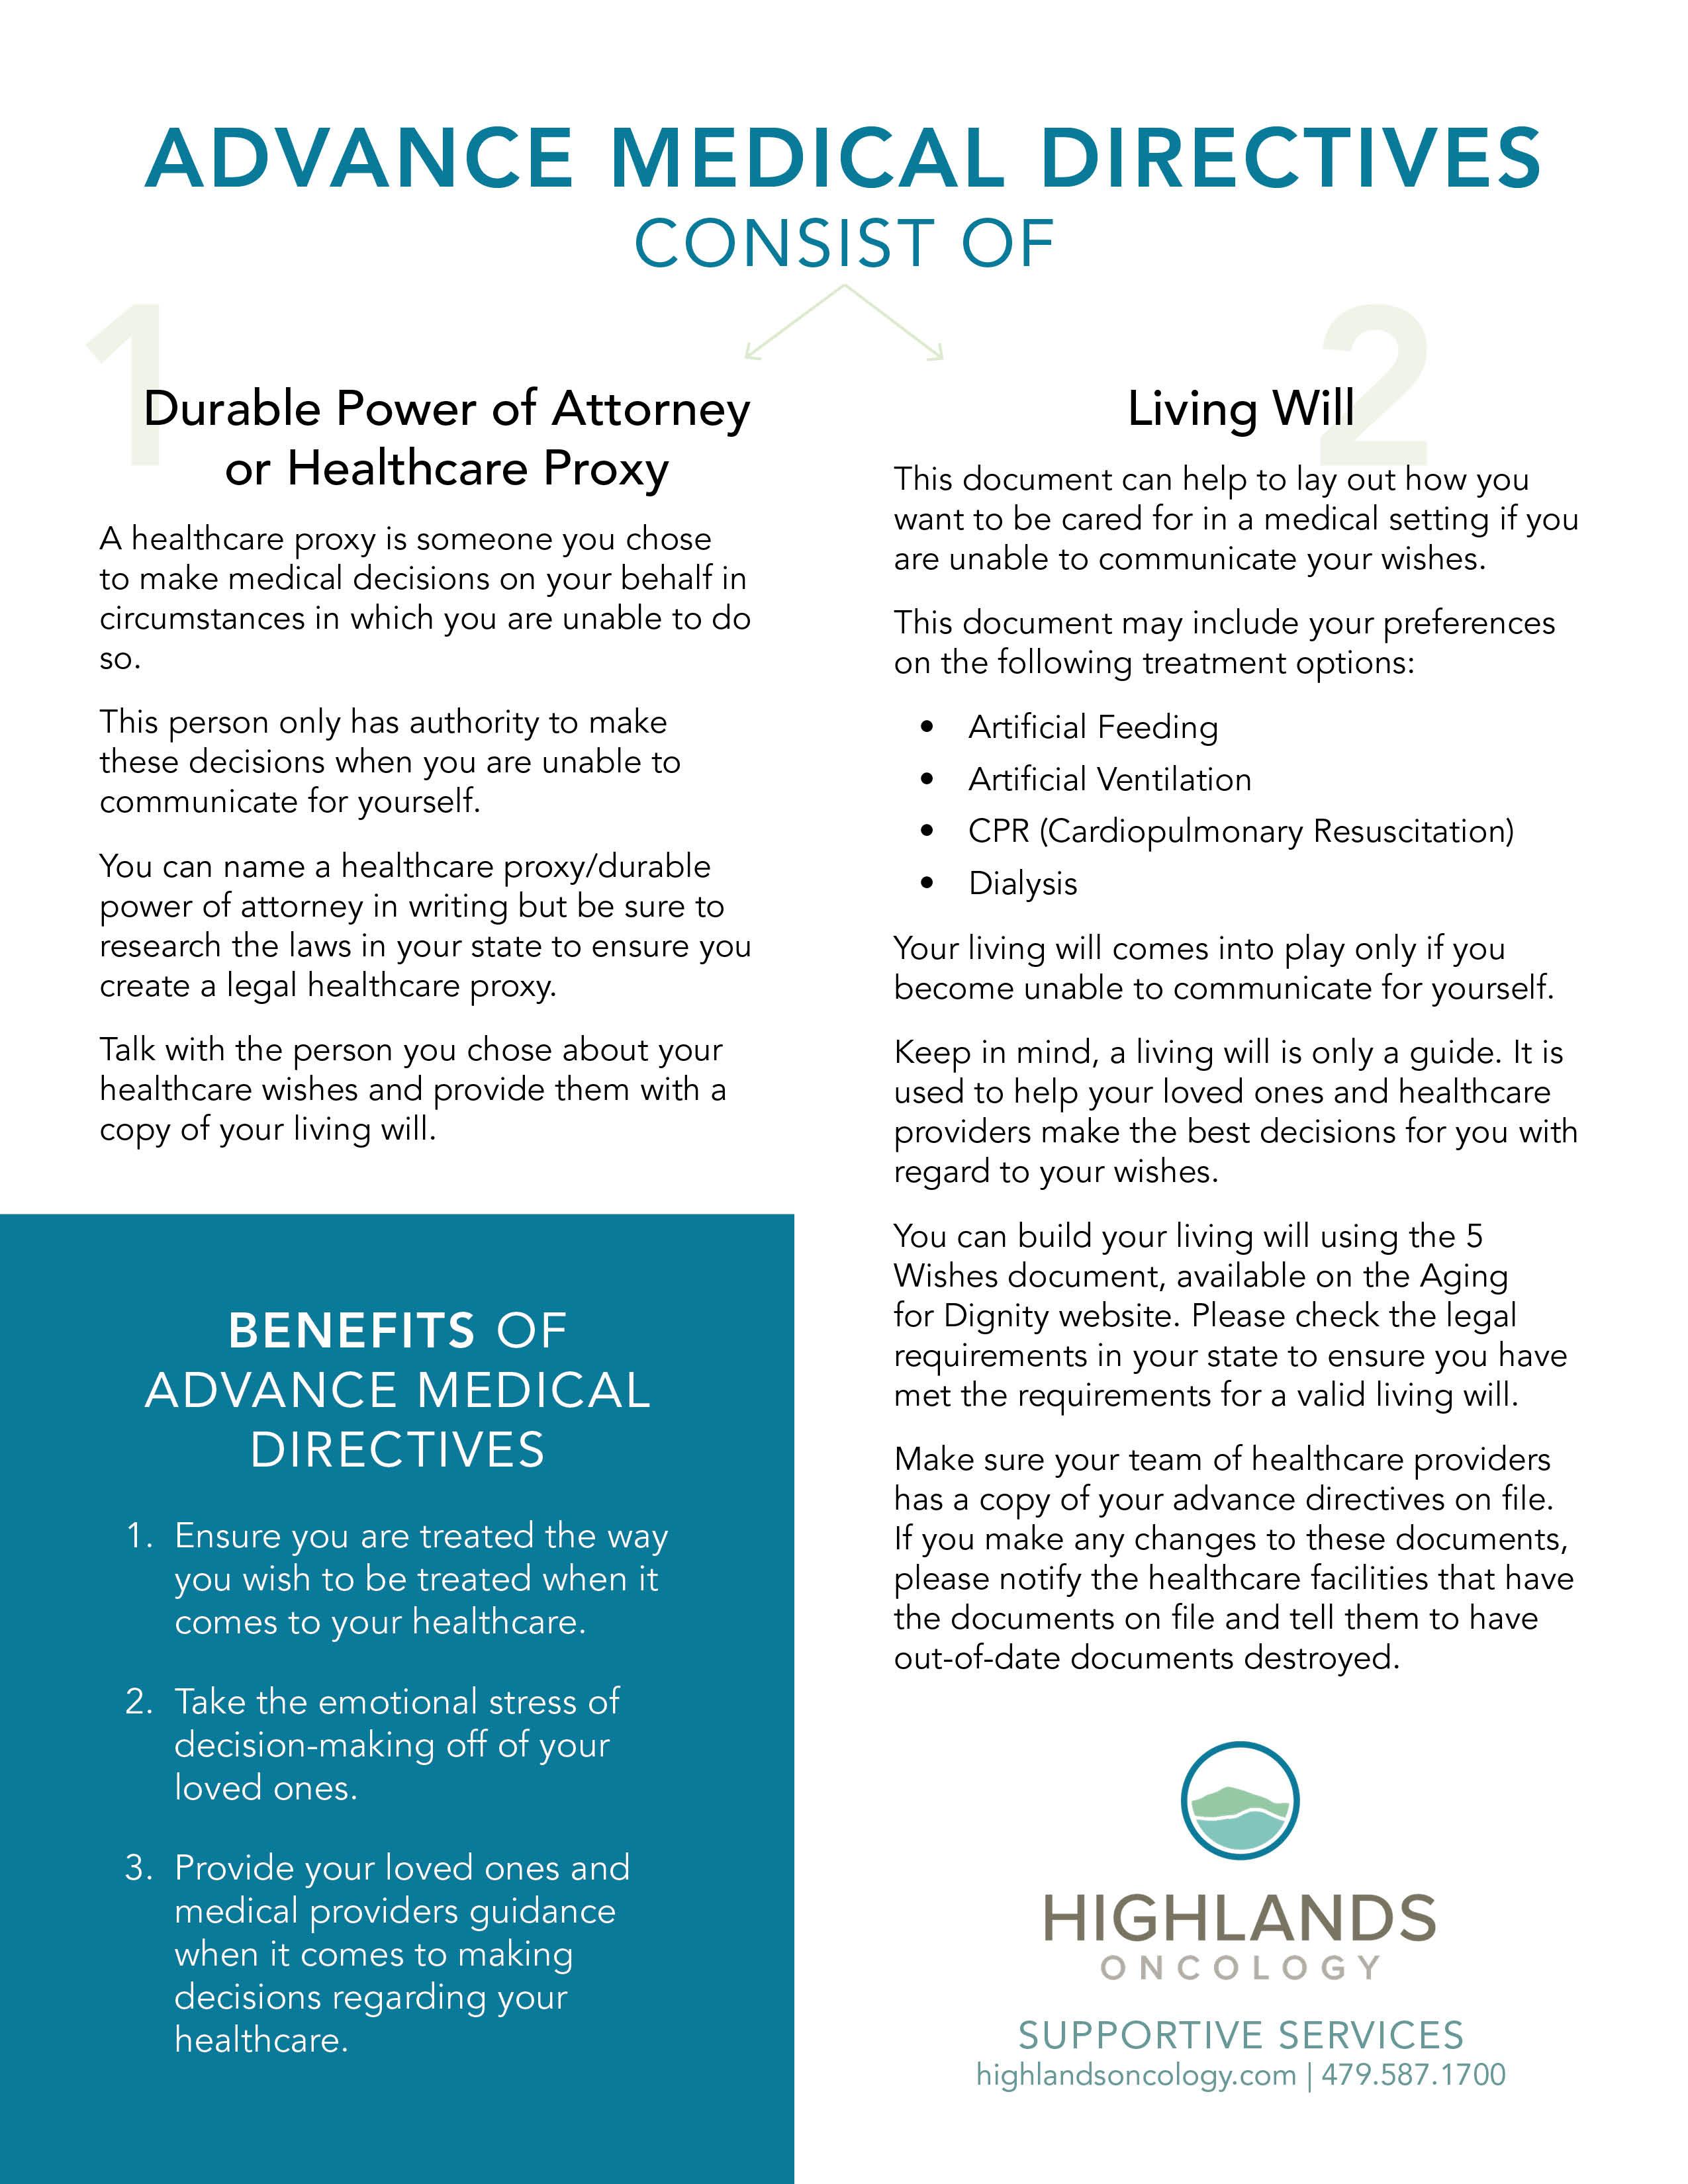 Advanced Medical Directives Information Sheet